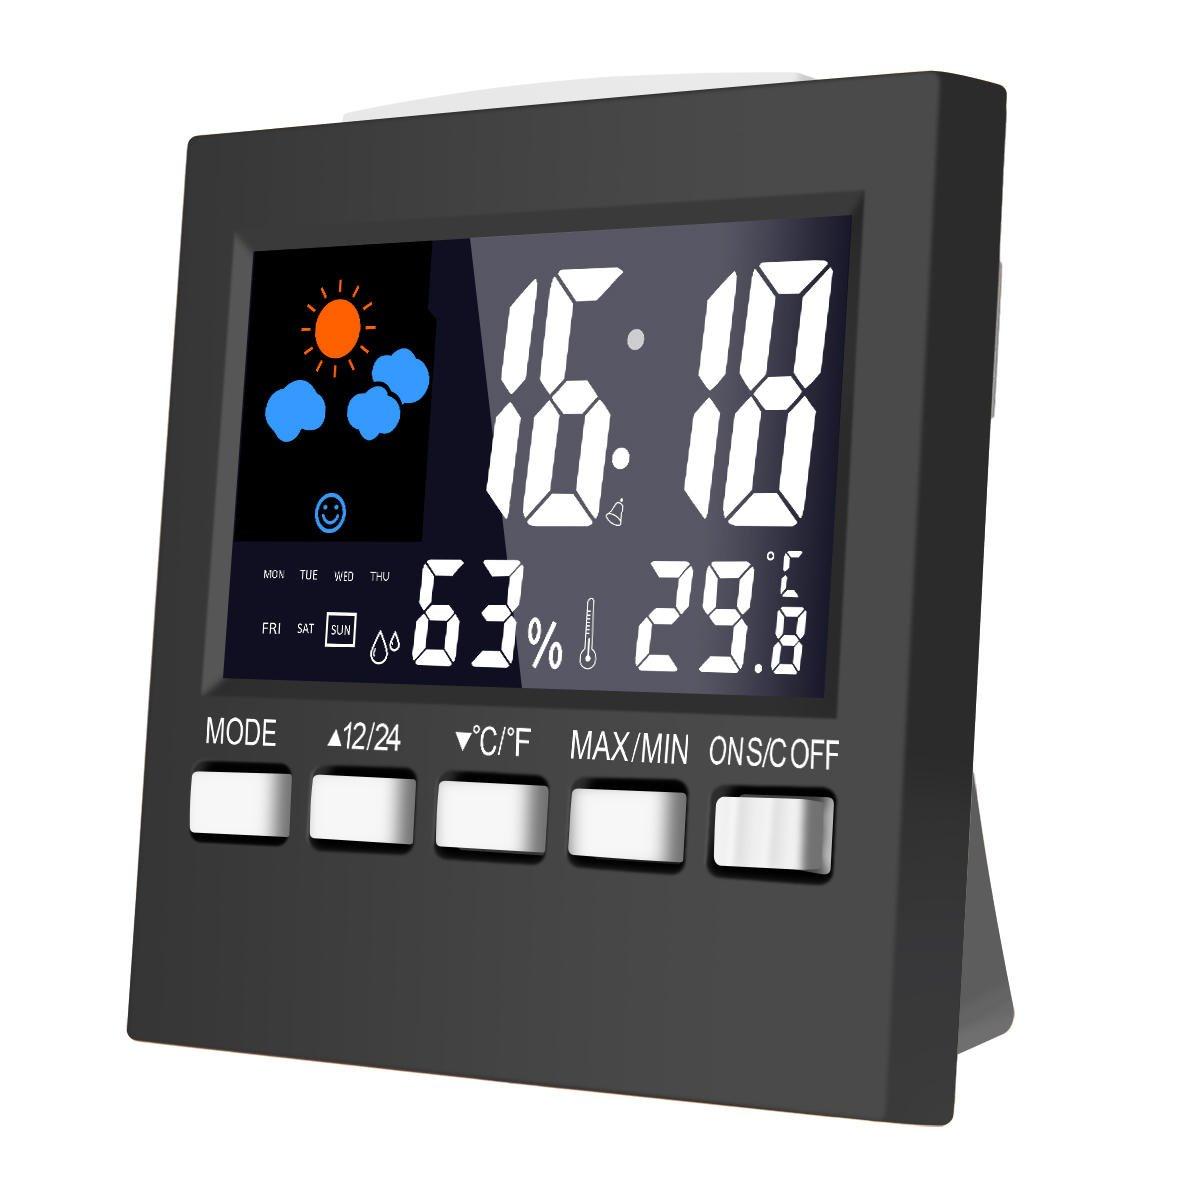 MOHOO Digital Temperature Hygrometer Monitor Indoor and Outdoor Digital Thermo-Hygrometer Digital Wireless Temperature Sensor Weather Station Clock Radio and Outdoor Sensor with Color Display